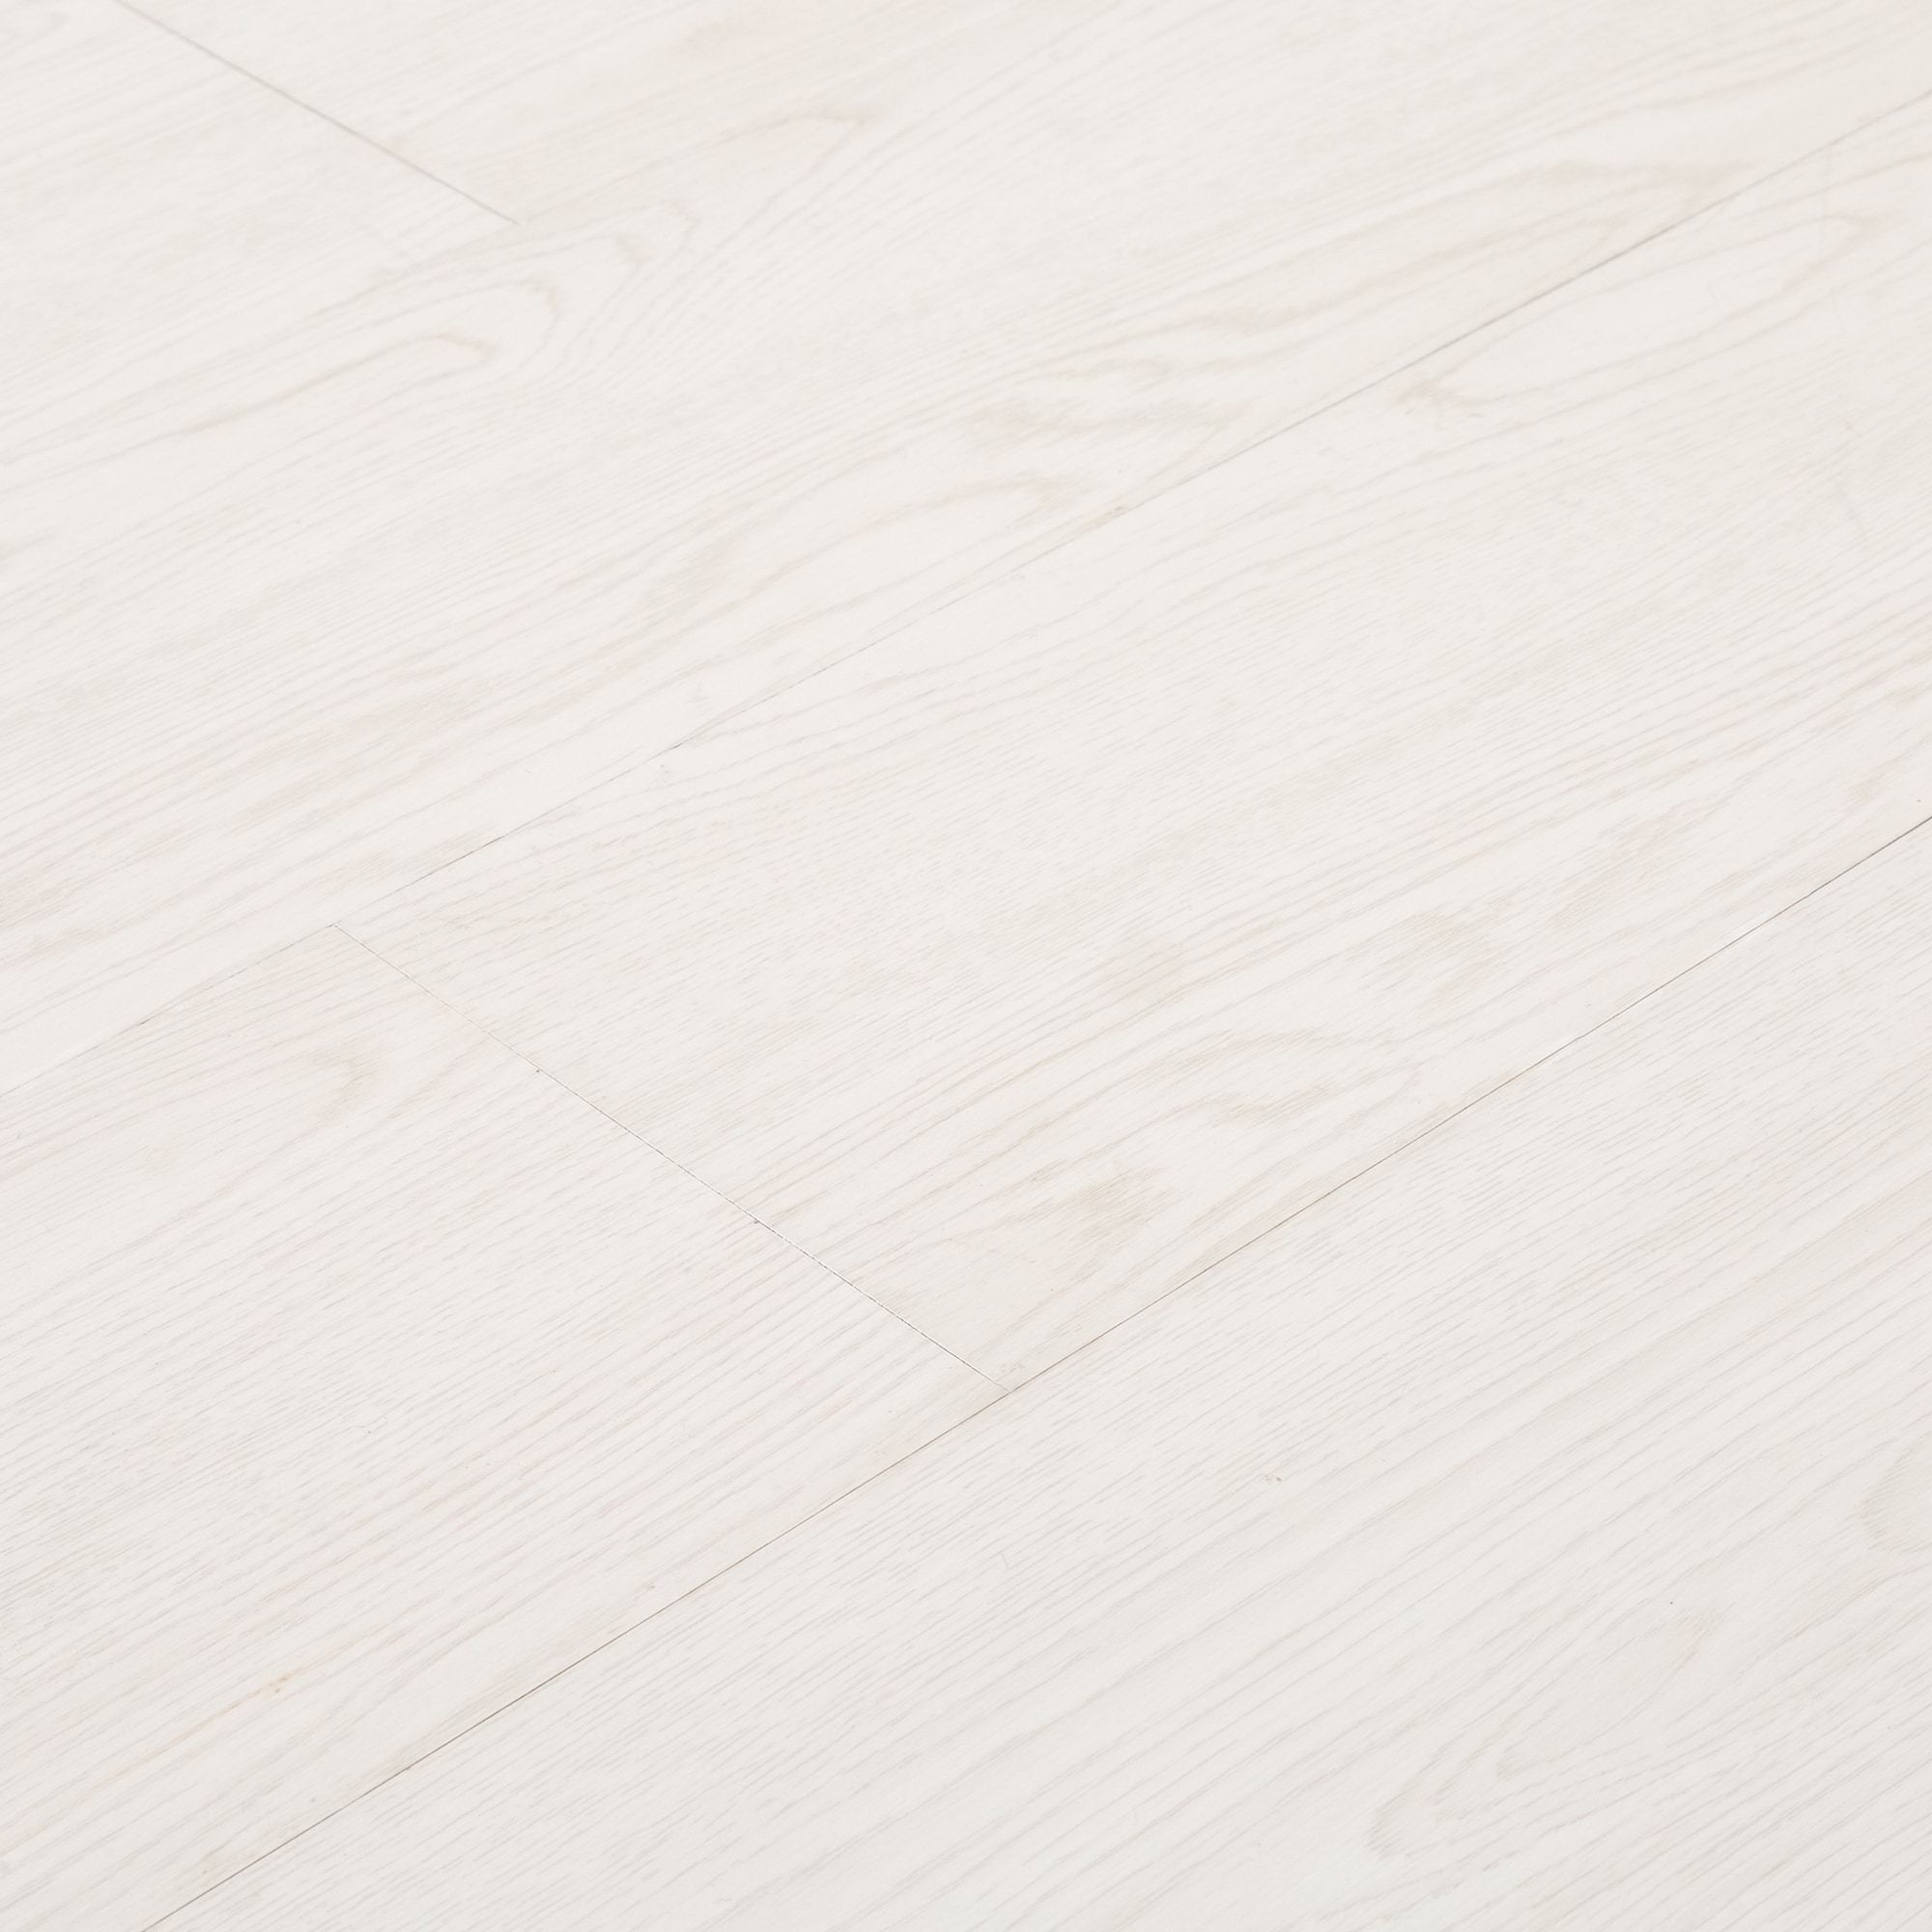 White Oak / 1.2mm / PVC / Peel & Stick Vinyl Planks - 1.2mm PVC Peel & Stick - Sterling Collection 0